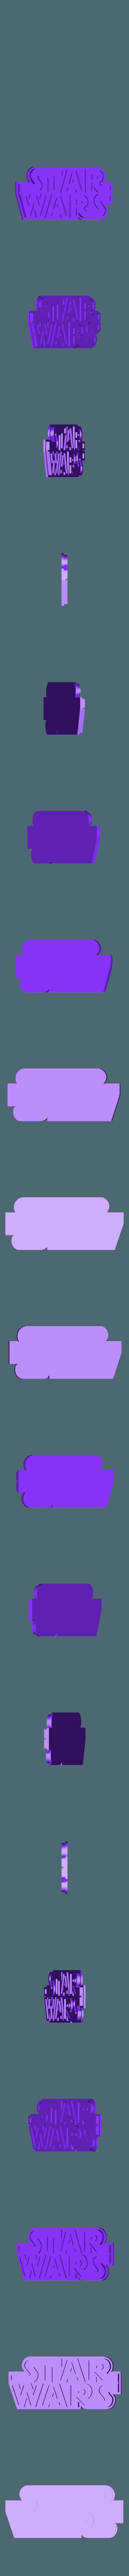 Starwar.STL Download free STL file STARWARS LOGO PLATE • Template to 3D print, Tum